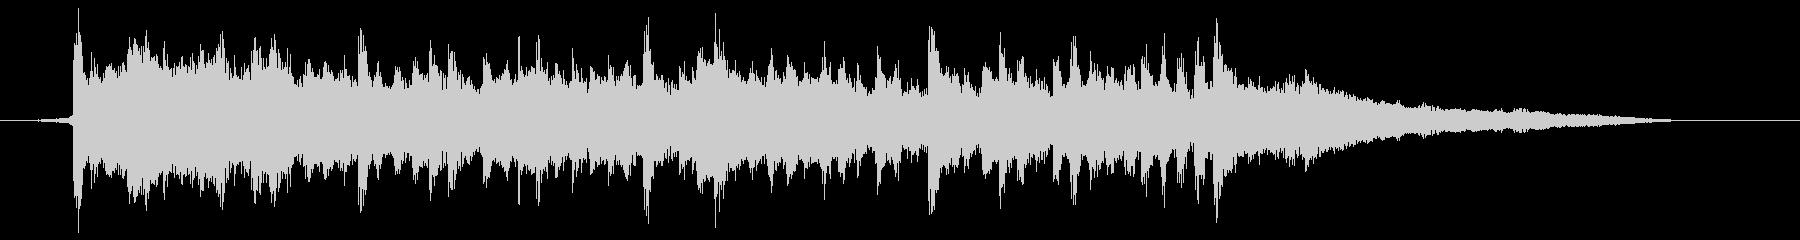 CM企業VP・30秒・明るい未来・ピアノの未再生の波形